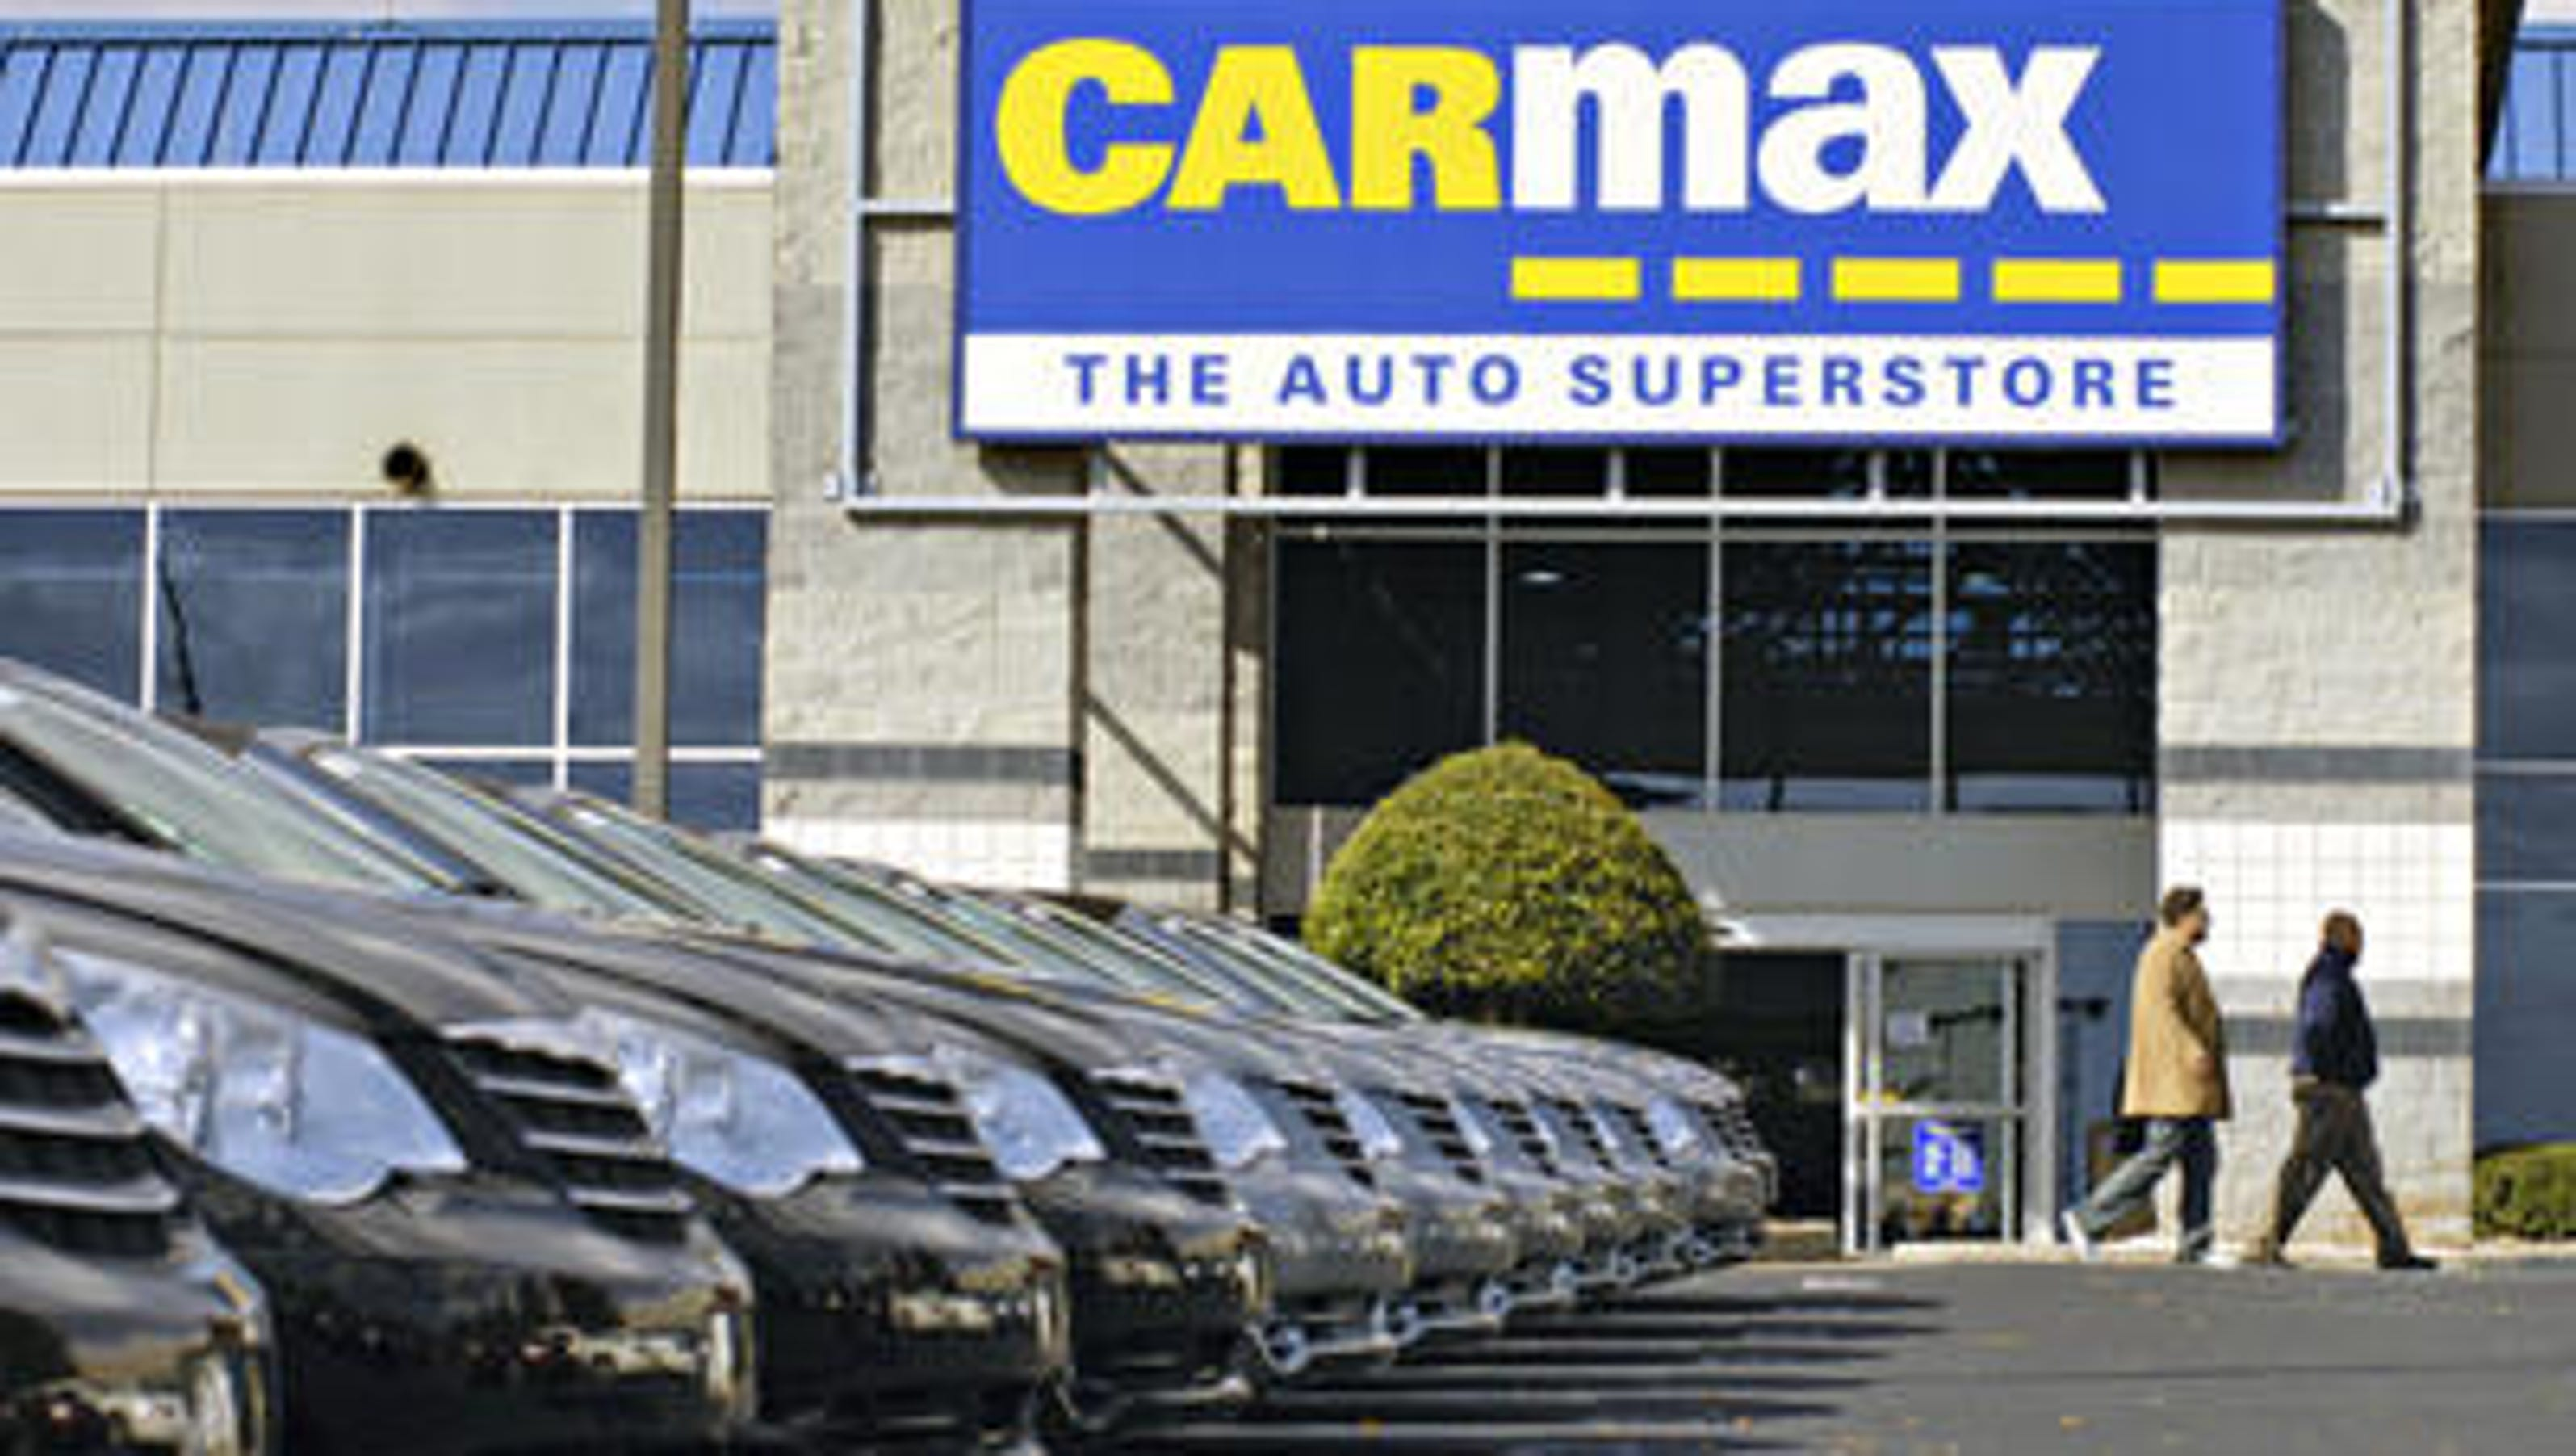 Does Carmax Buy Cars: Used Car Dealer CarMax Reports 1Q Profit Spike